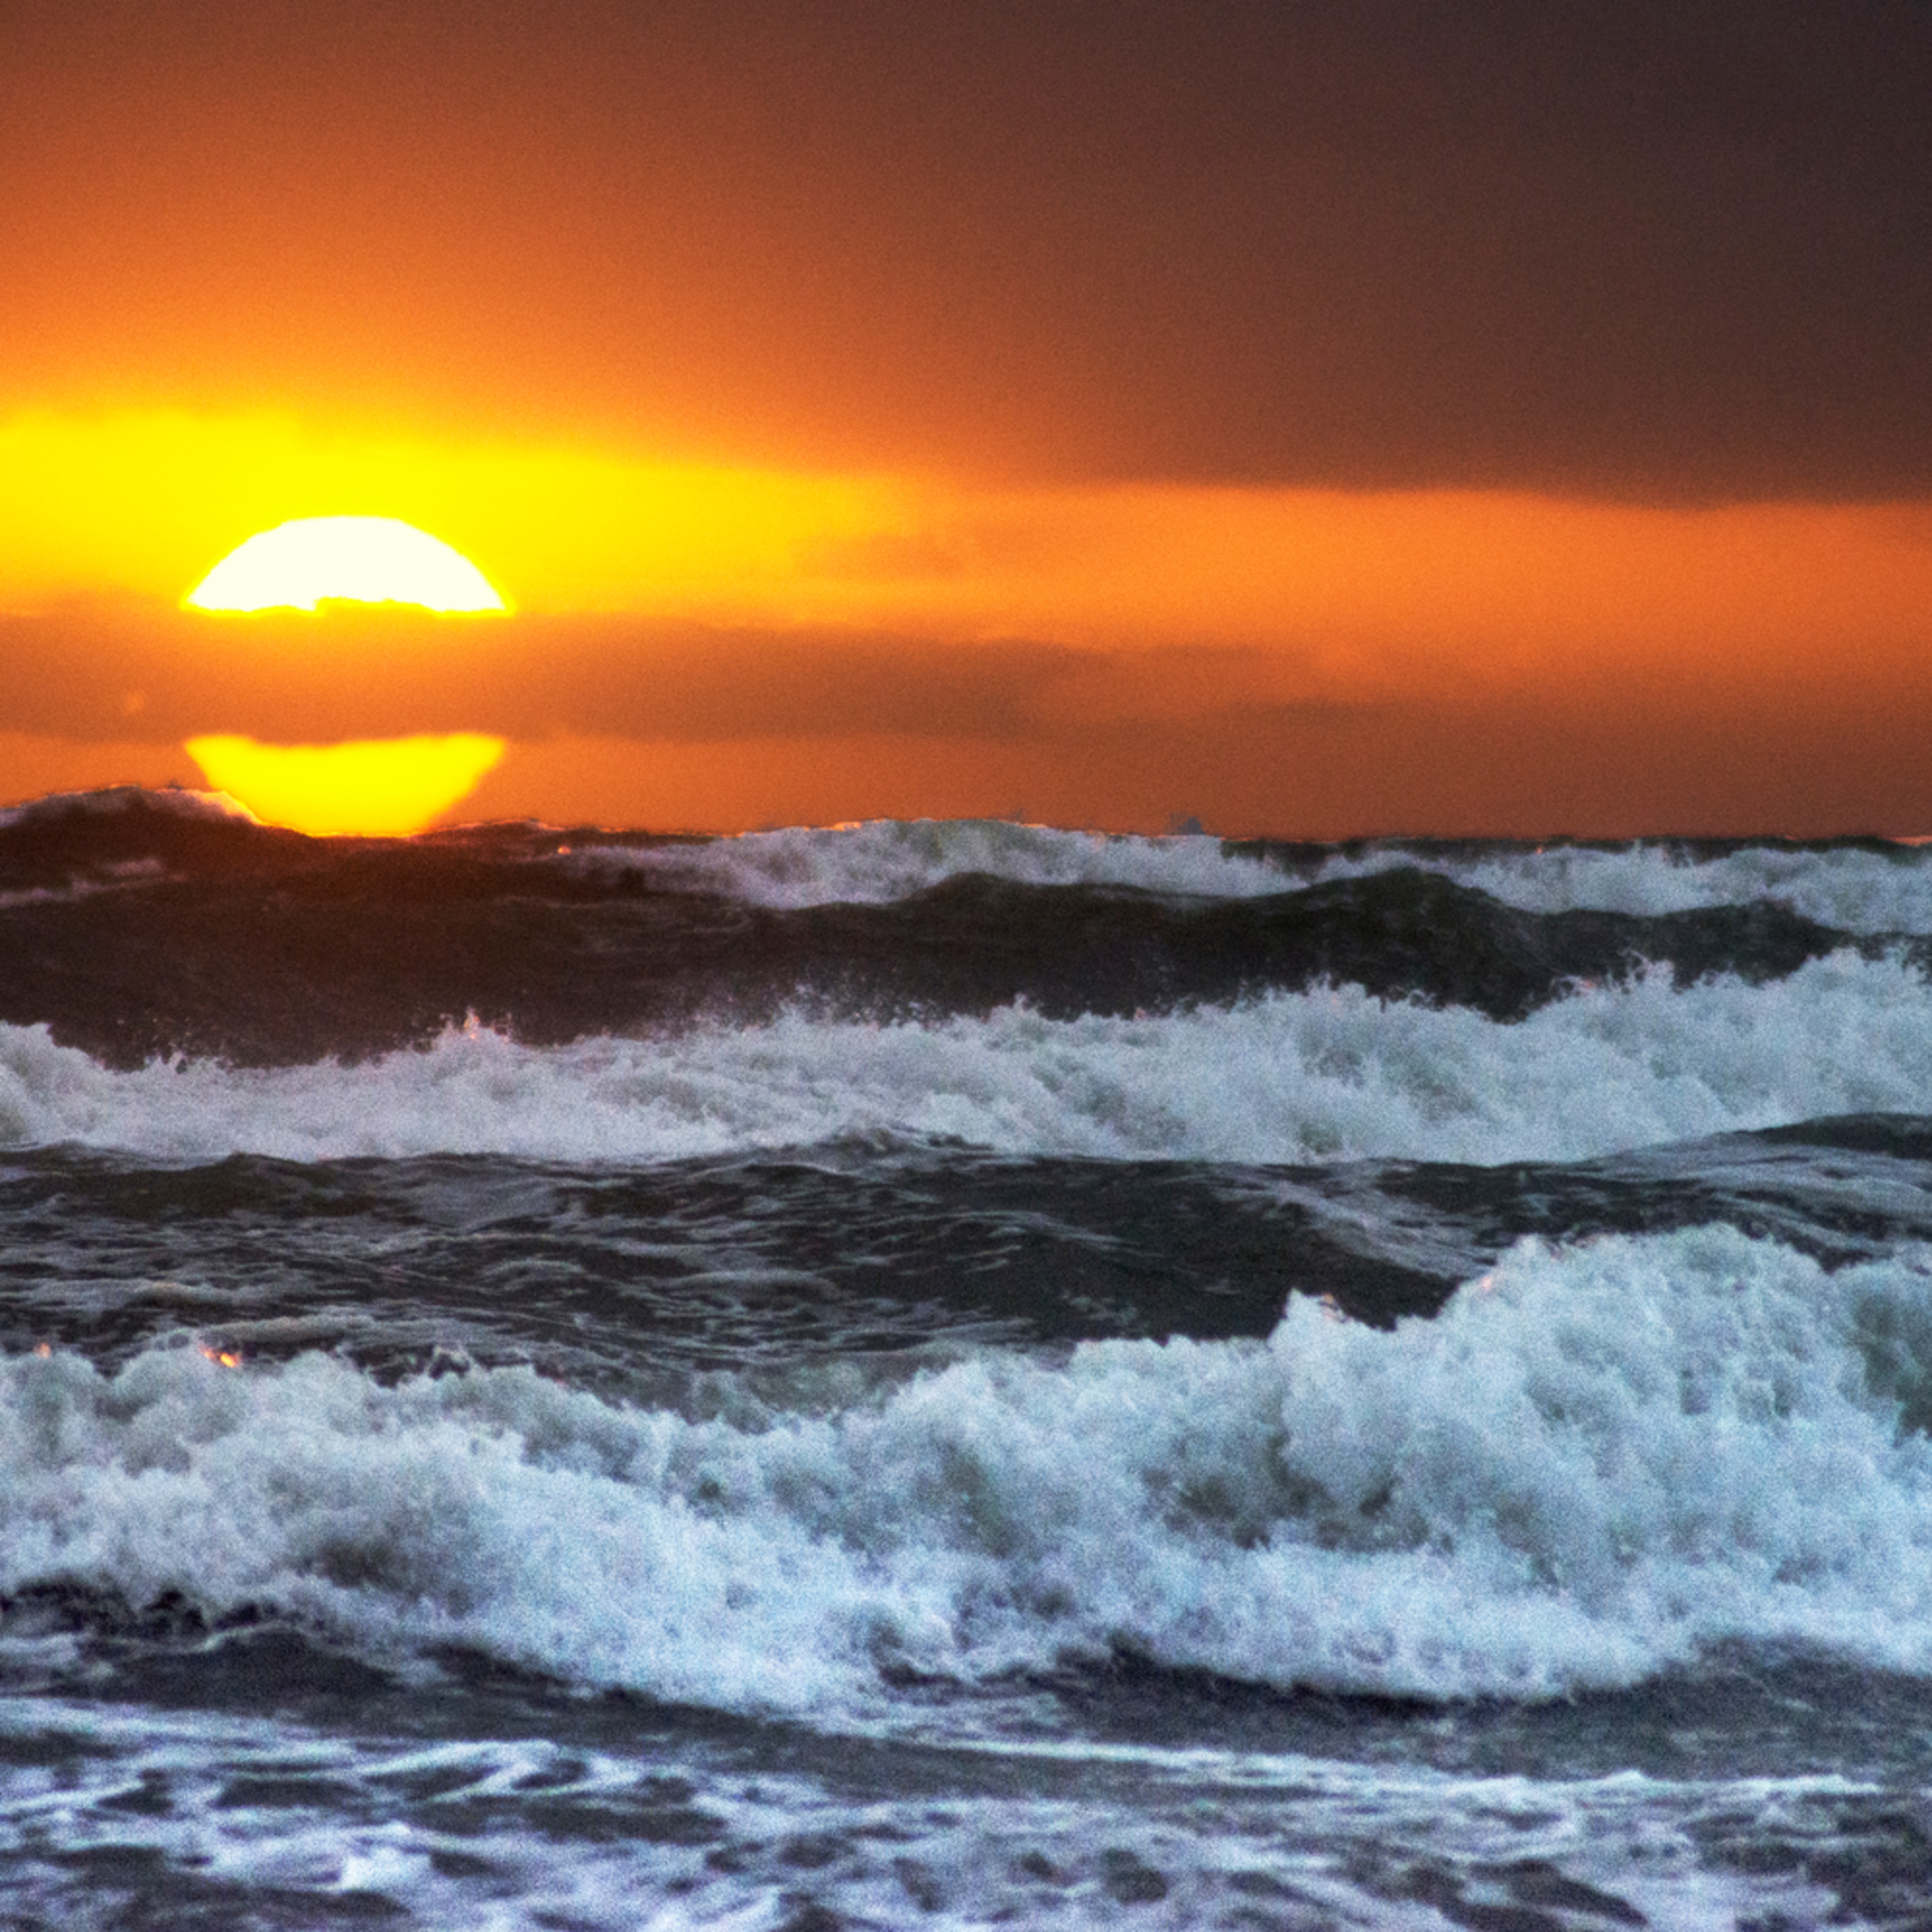 180126 juno beach 091 3 nxnpxb